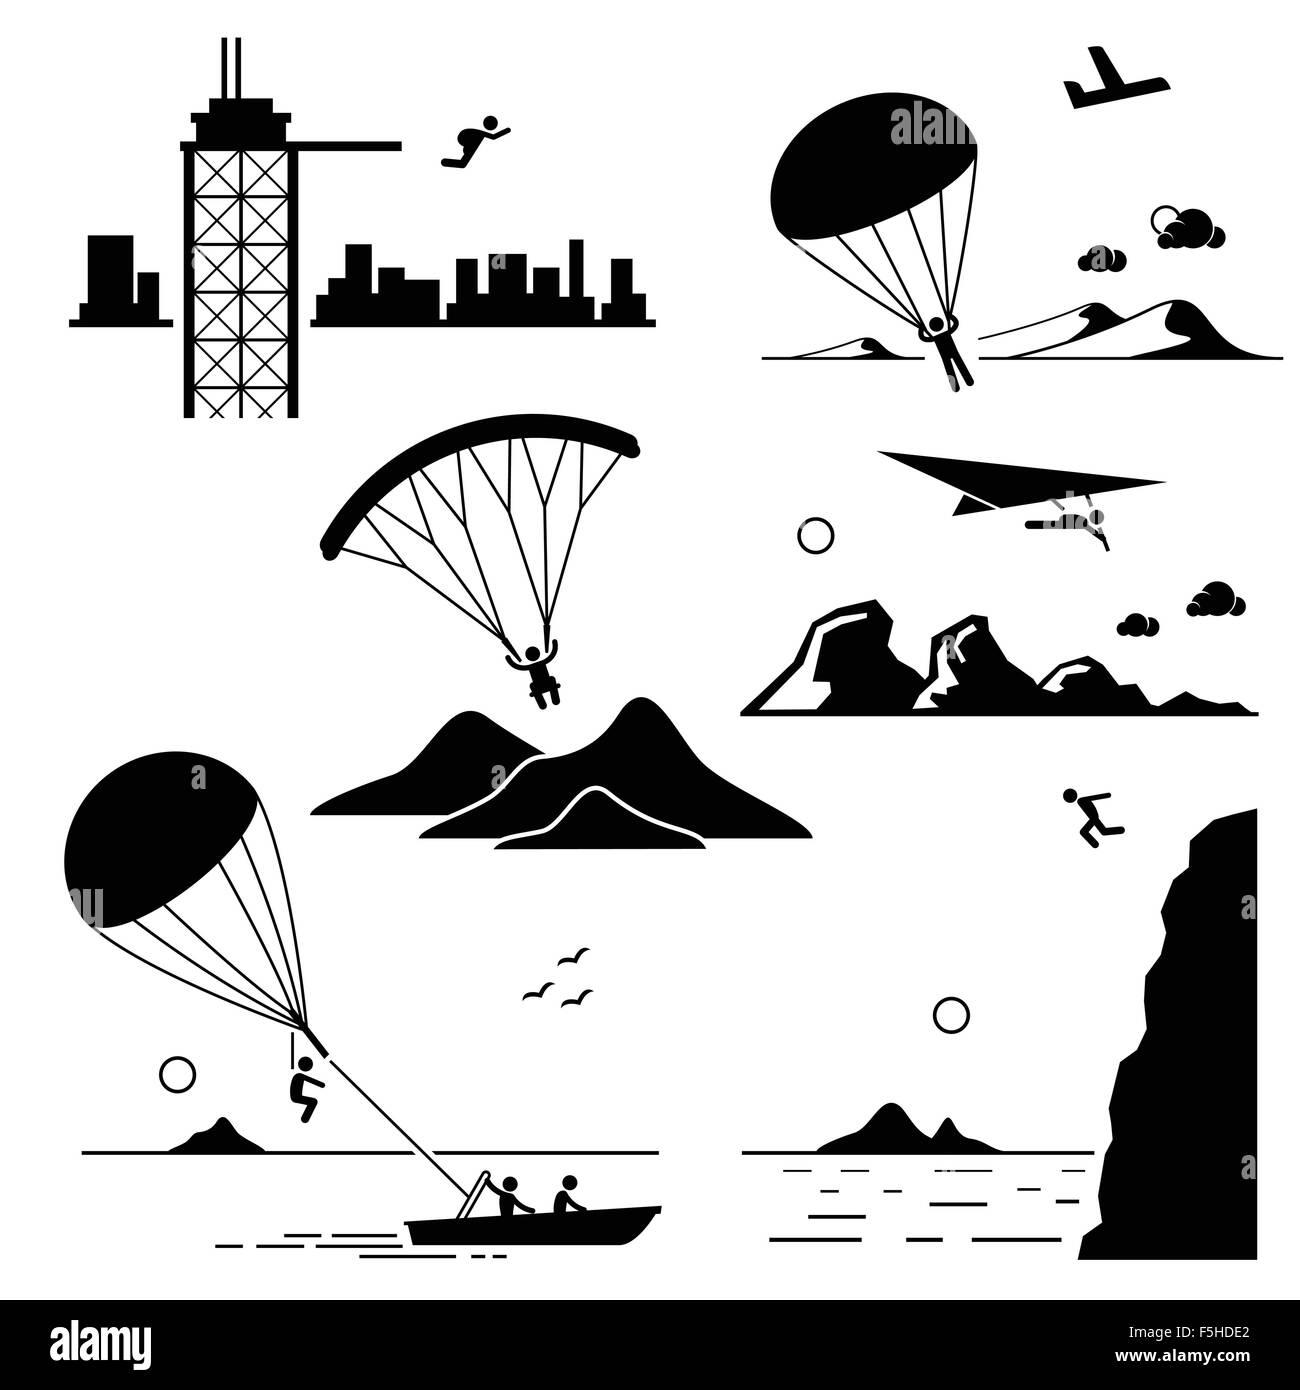 Extreme Sports - Base Jumping, Parachuting, Paragliding, Hang Gliding, Parasailing, Cliff Jump - Stick Figure Pictogram - Stock Image